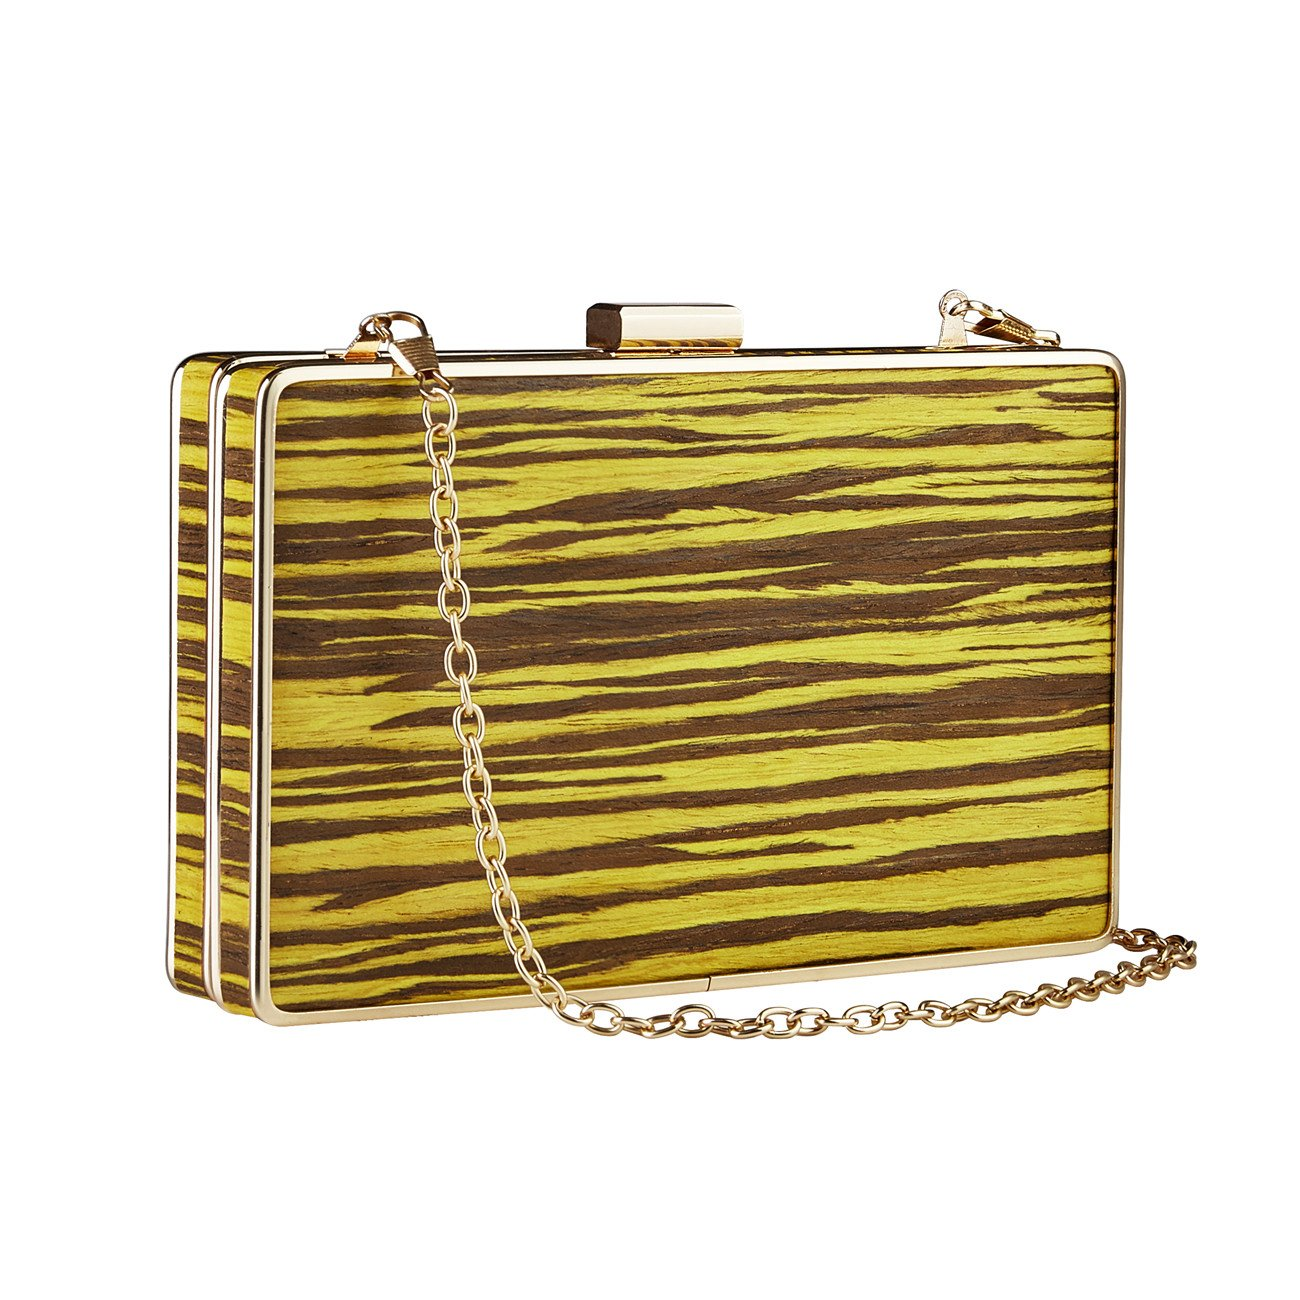 GGBAZZARA Vintage Wood grain Handbags For Womens Purse Party Clutches (yellow)